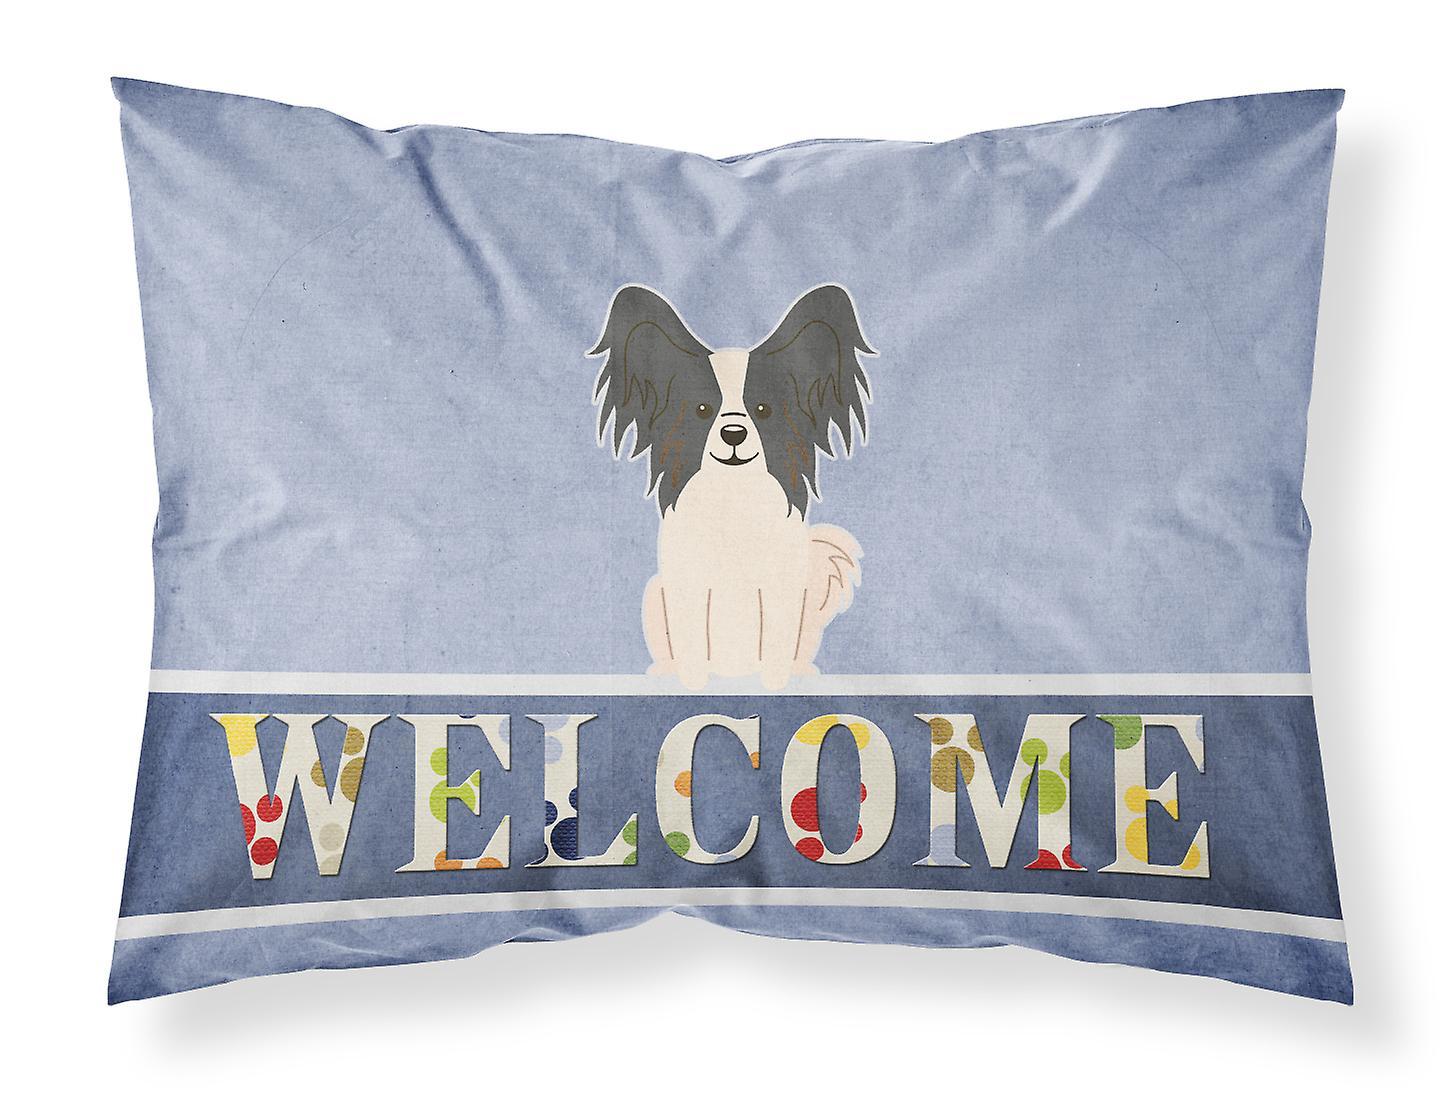 Bienvenue Papillon Du Standard D'oreiller Noir Taie Blanc Tissu fg6vyb7YI